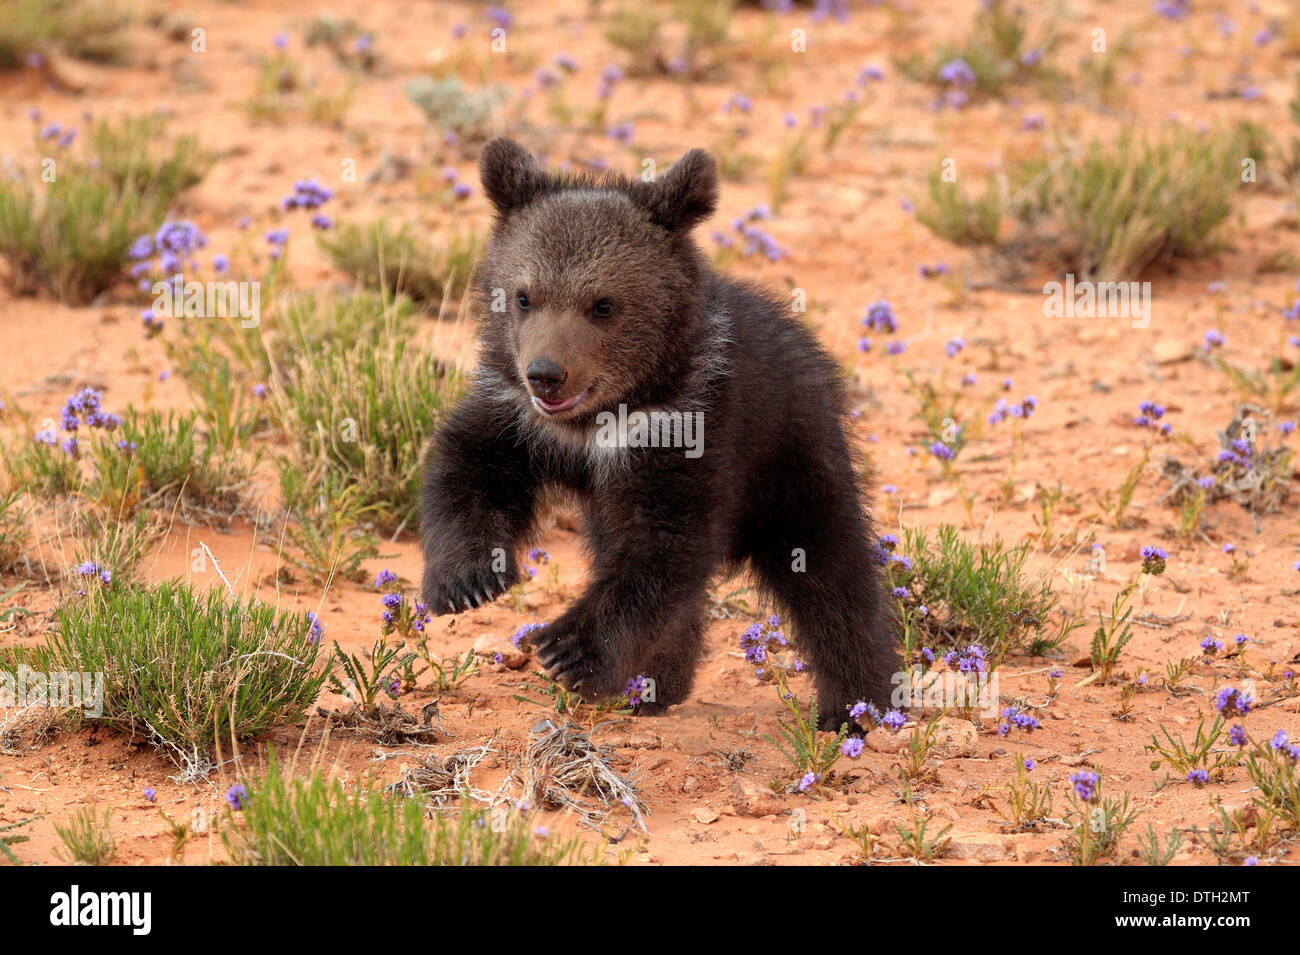 Grizzly Bear, 3 months, Monument Valley, Utah, USA / (Ursus arctos horribilis) - Stock Image